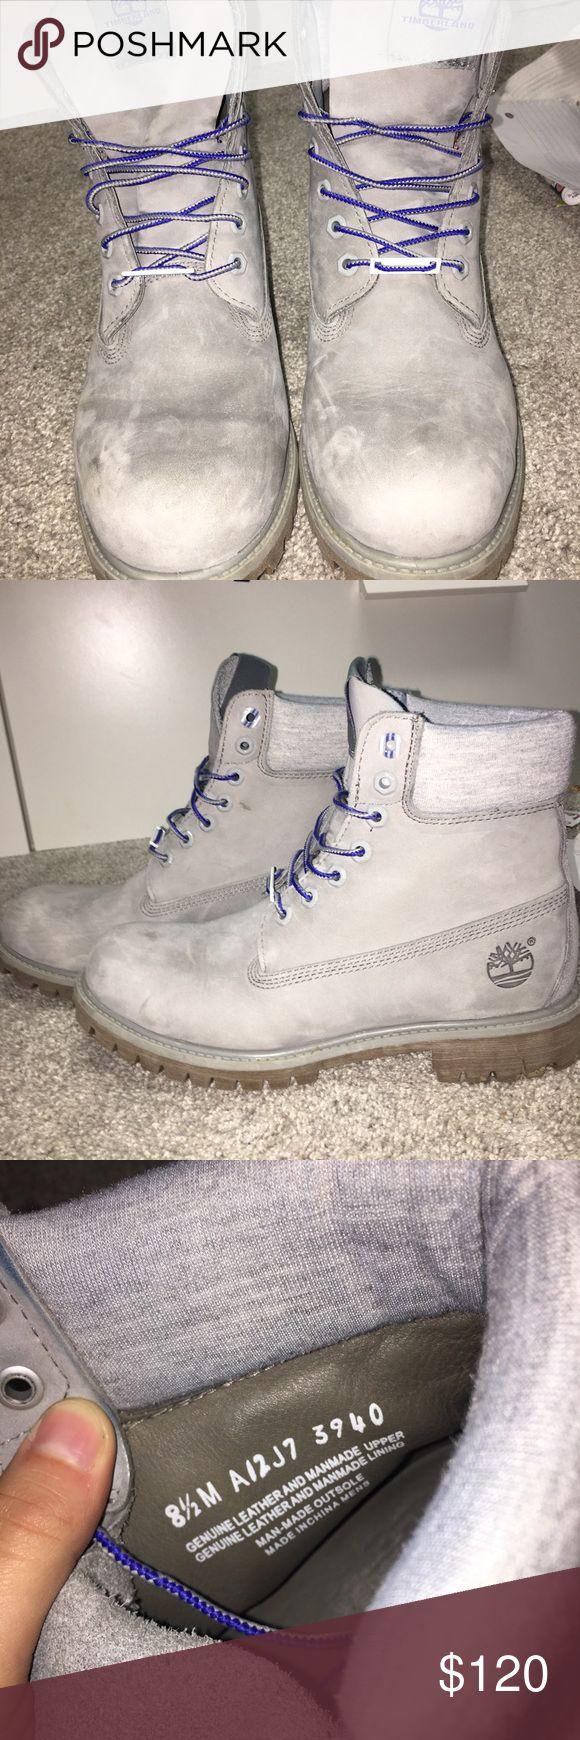 Grey Suede Timberland Boots Men's grey Timberland Boots Great Condition Timberland Shoes Boots